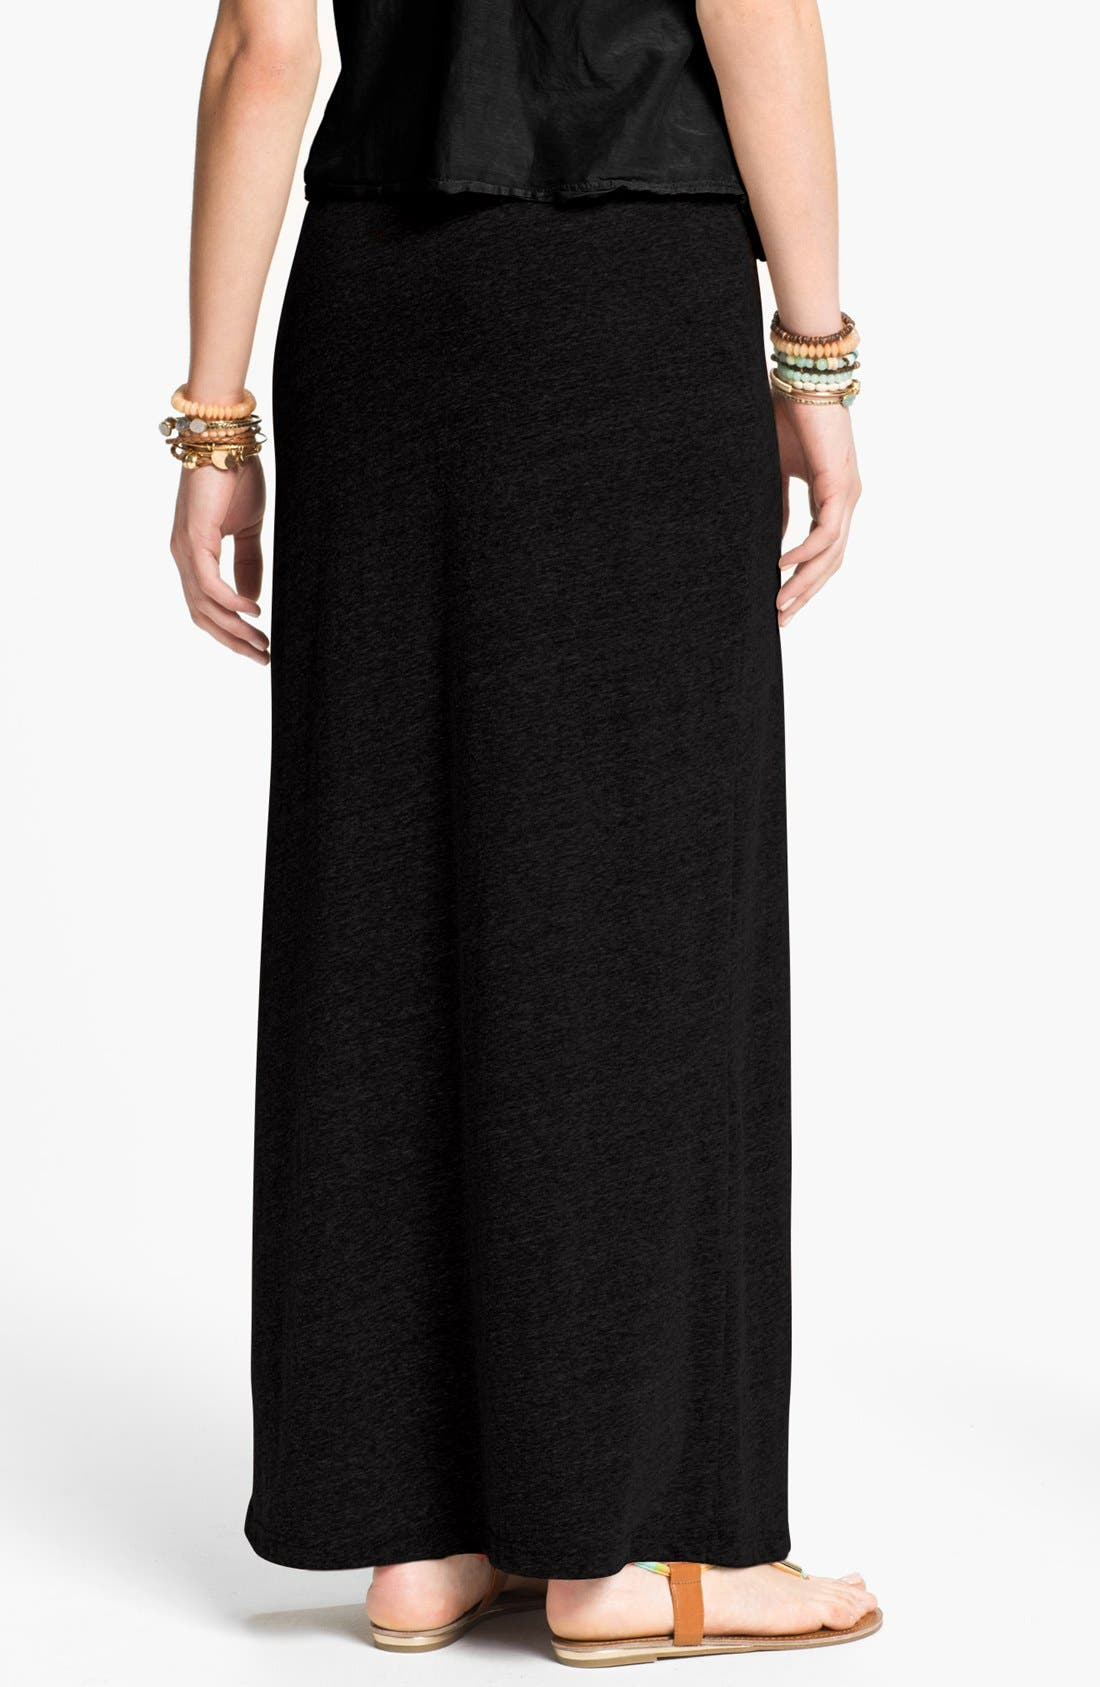 Alternate Image 2  - h.i.p. Tri-Blend Knit Maxi Skirt (Juniors)